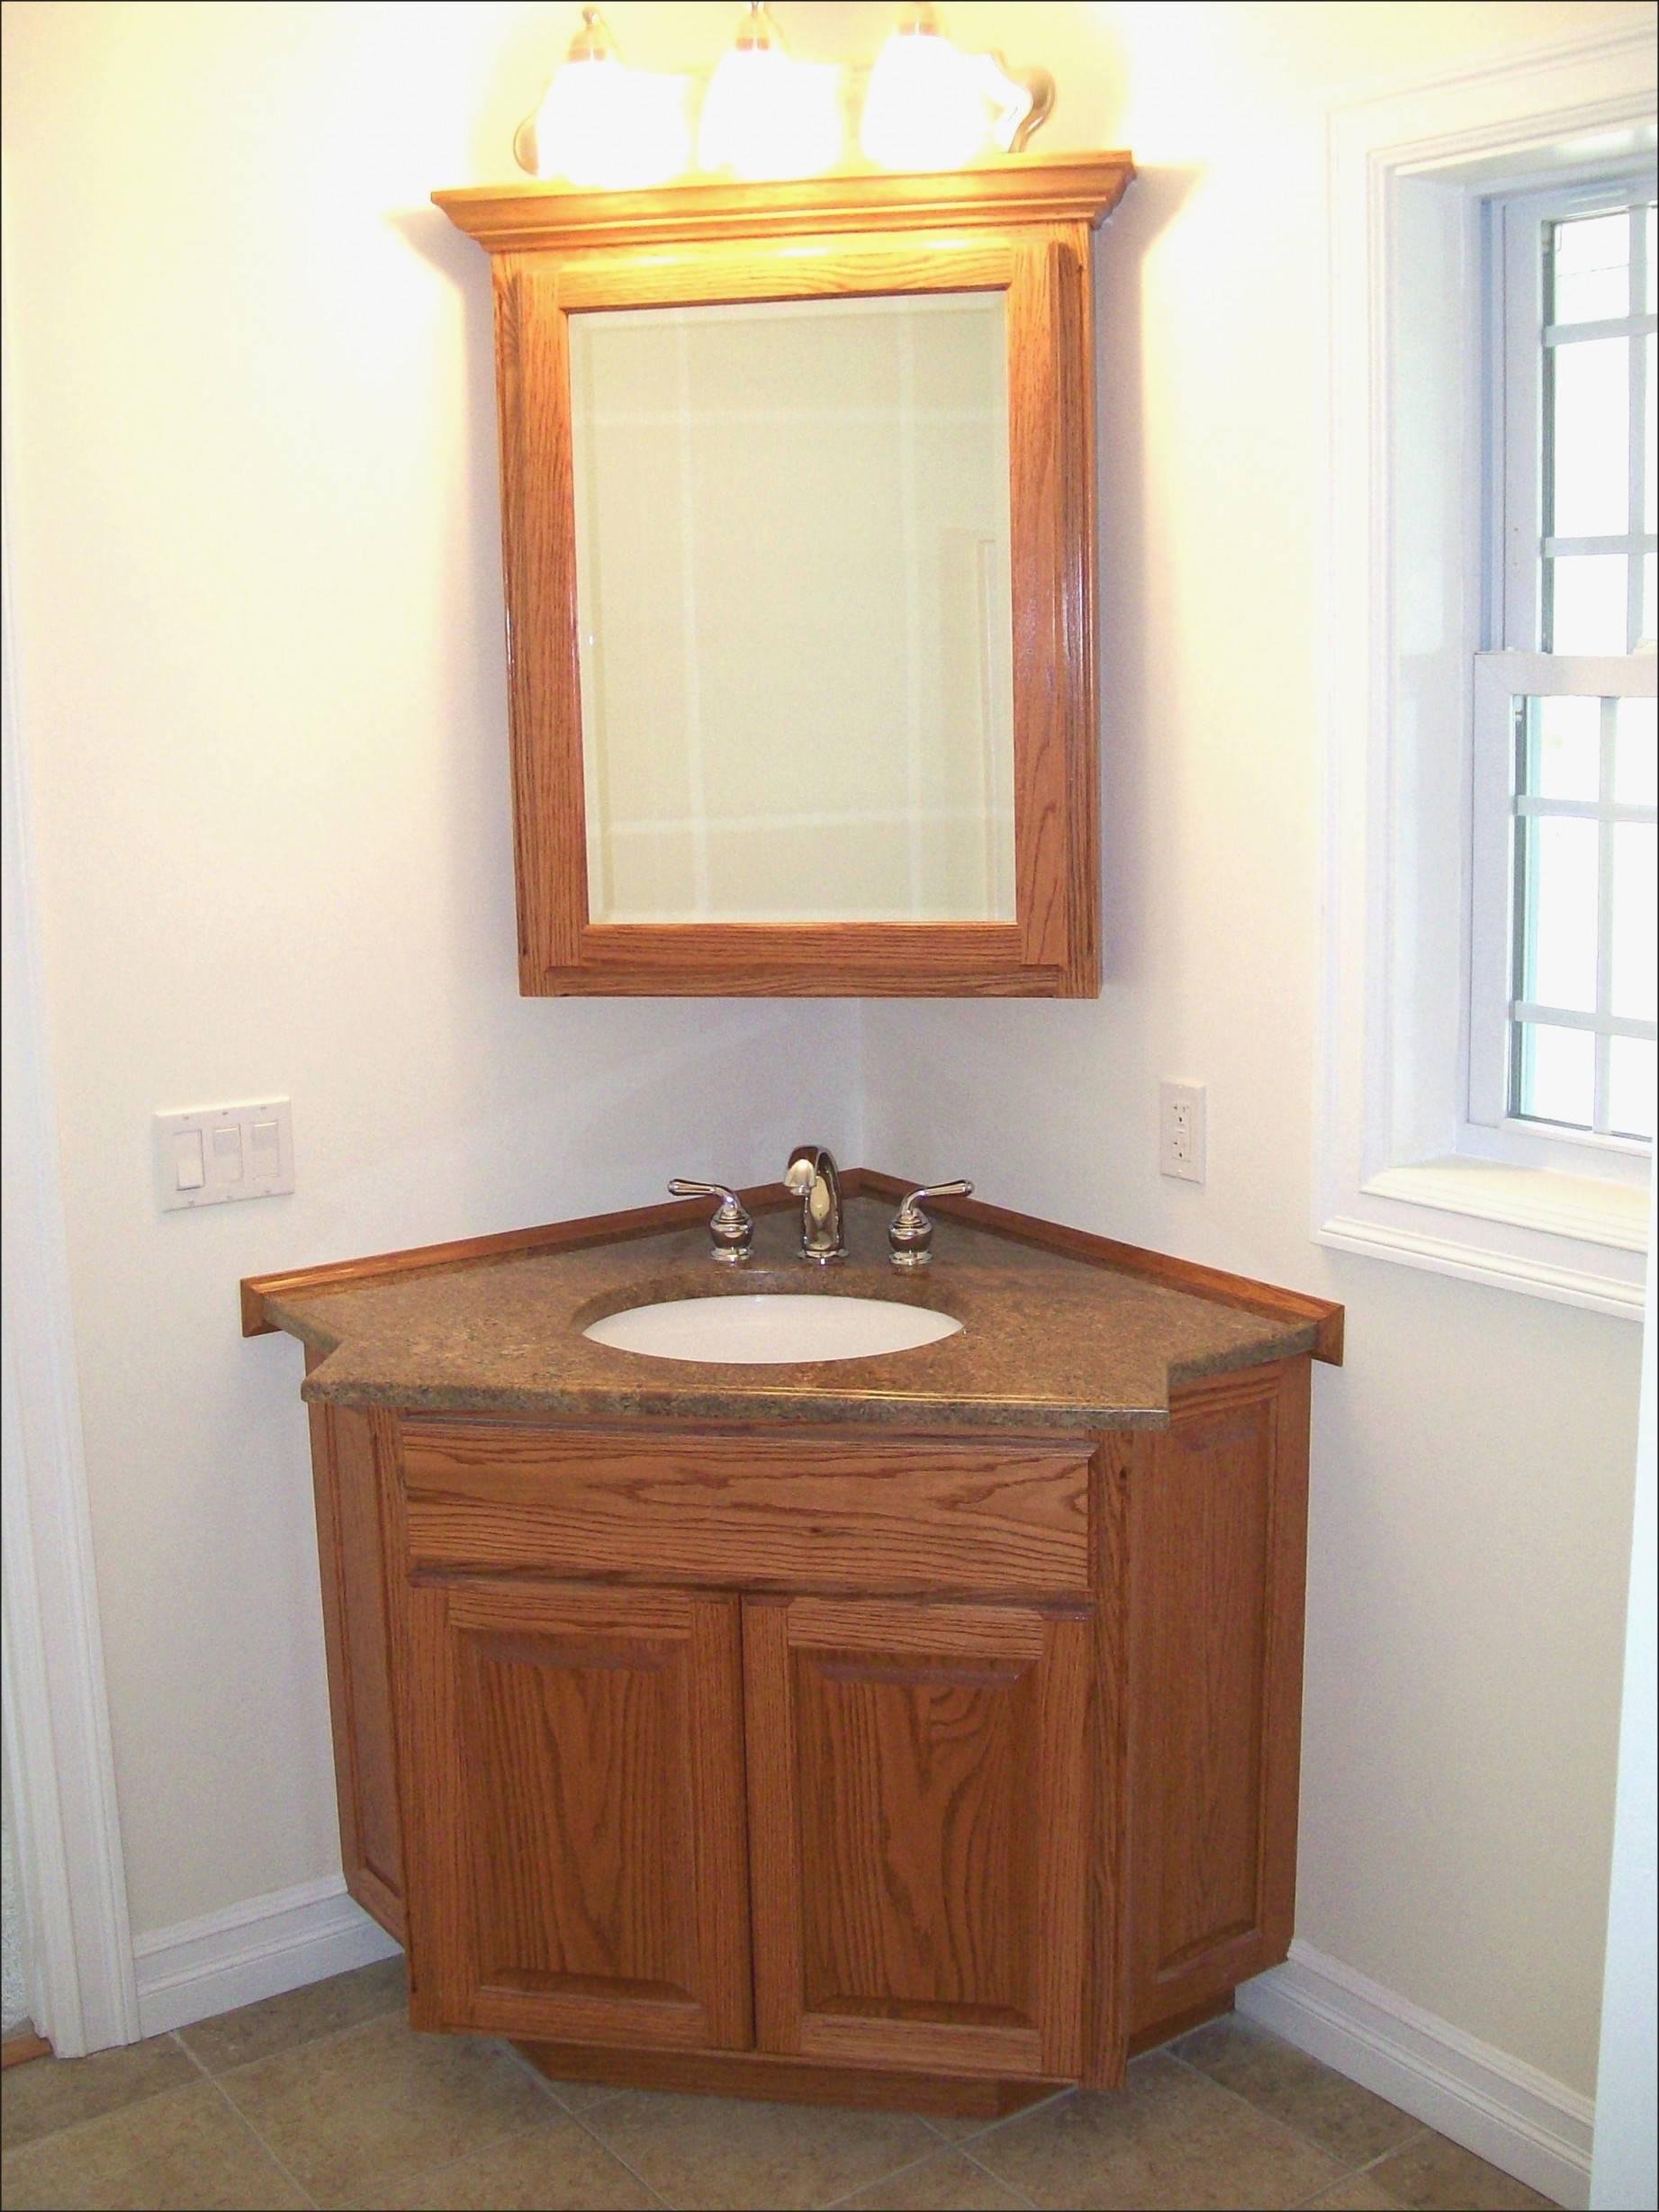 bathroom cabinets diy best of beautiful corner bathroom sink and cabinet of bathroom cabinets diy